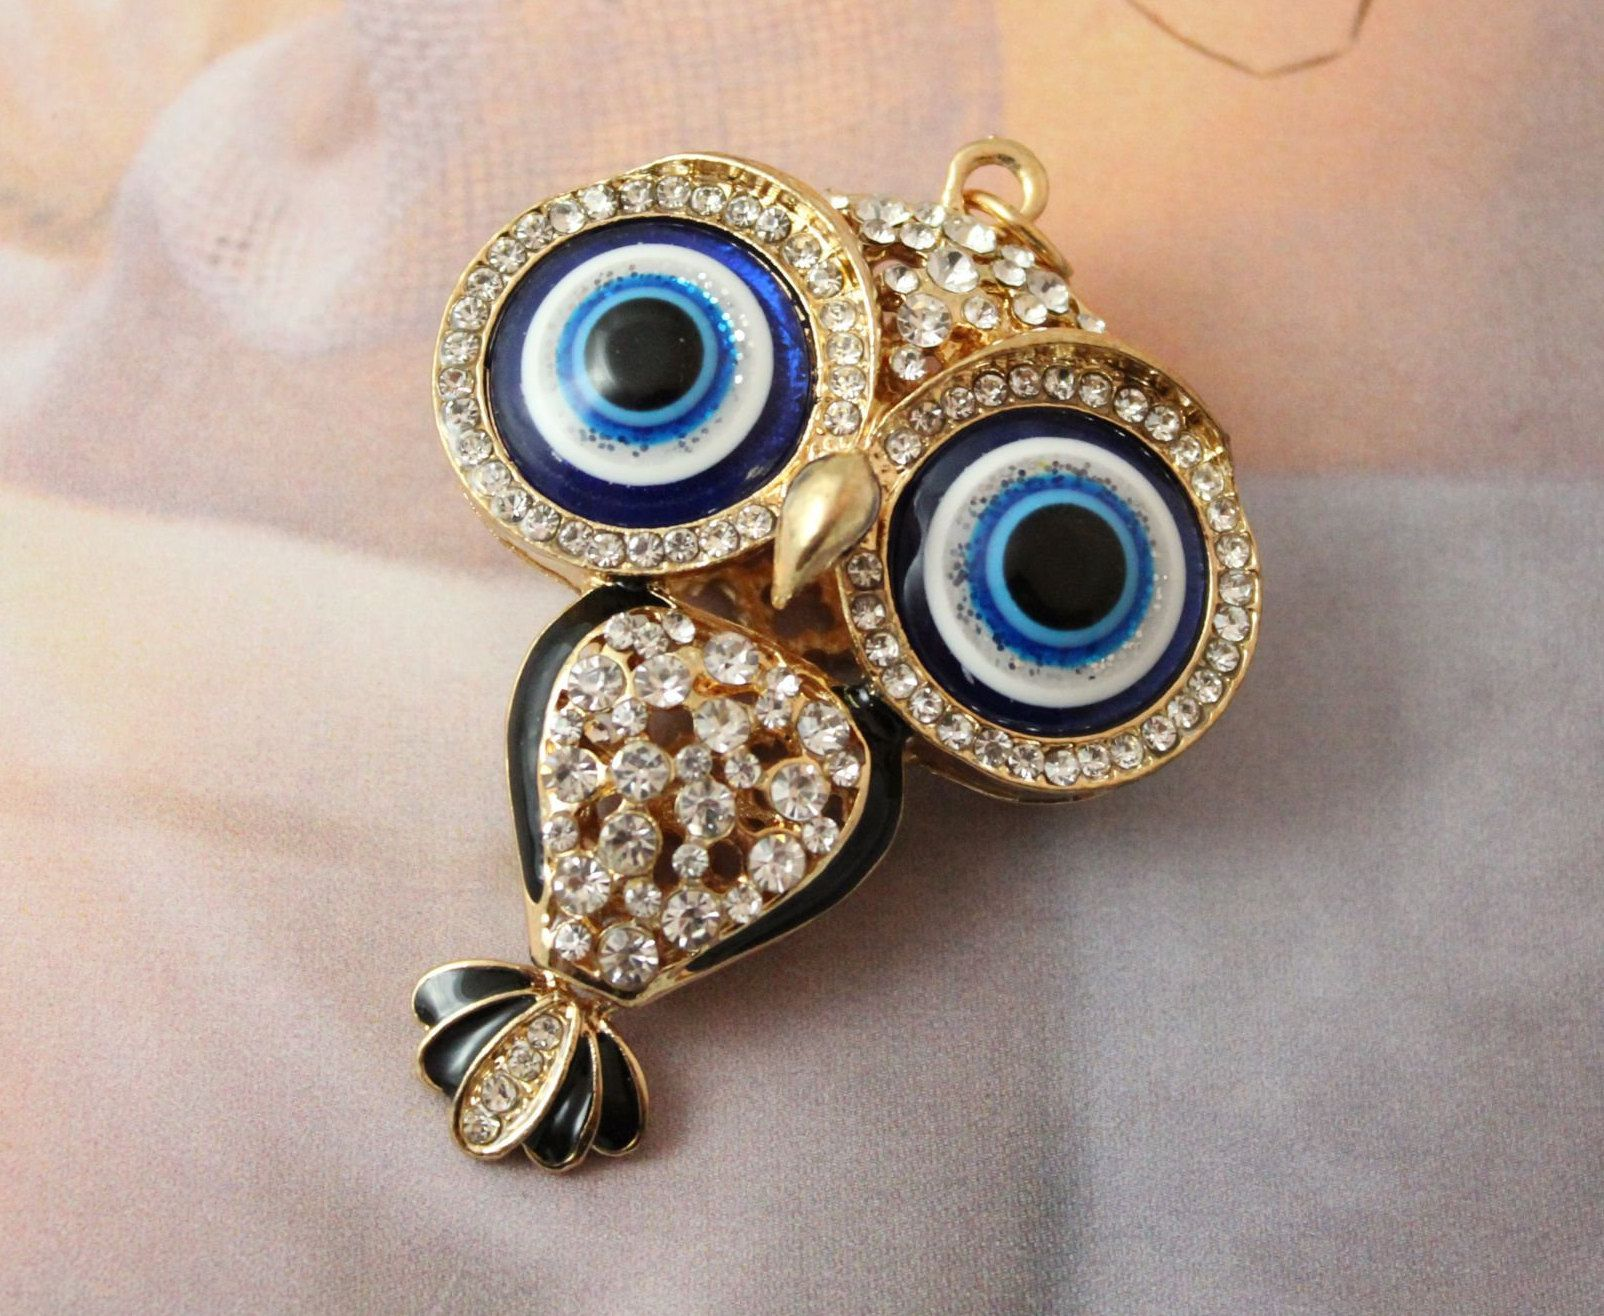 Adorable Cute Gold Tone Colorful Crystal Rhinestone Owl Bird Pendant Necklace